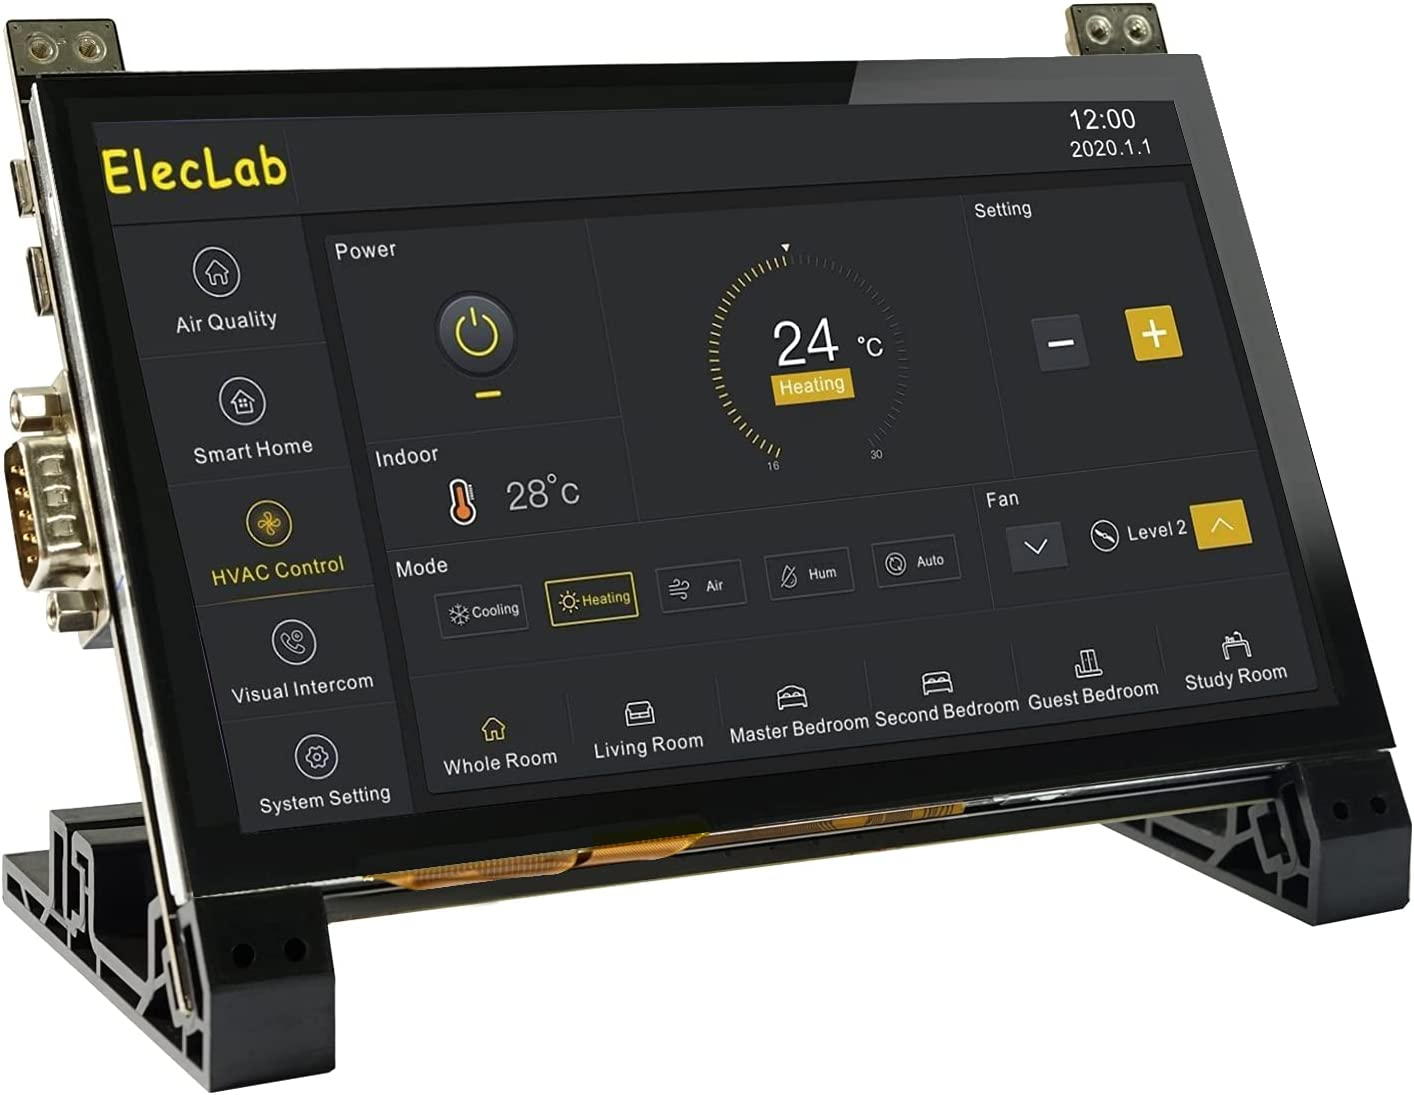 ElecLab Raspberry Pi Touchscreen Monitor 7 Inch DSI Capacitive LCD Display 800x480 RS232/RS485 Speaker Bracket for Raspberry Pi 4B 3B+ 3B 3A+ 2B B+